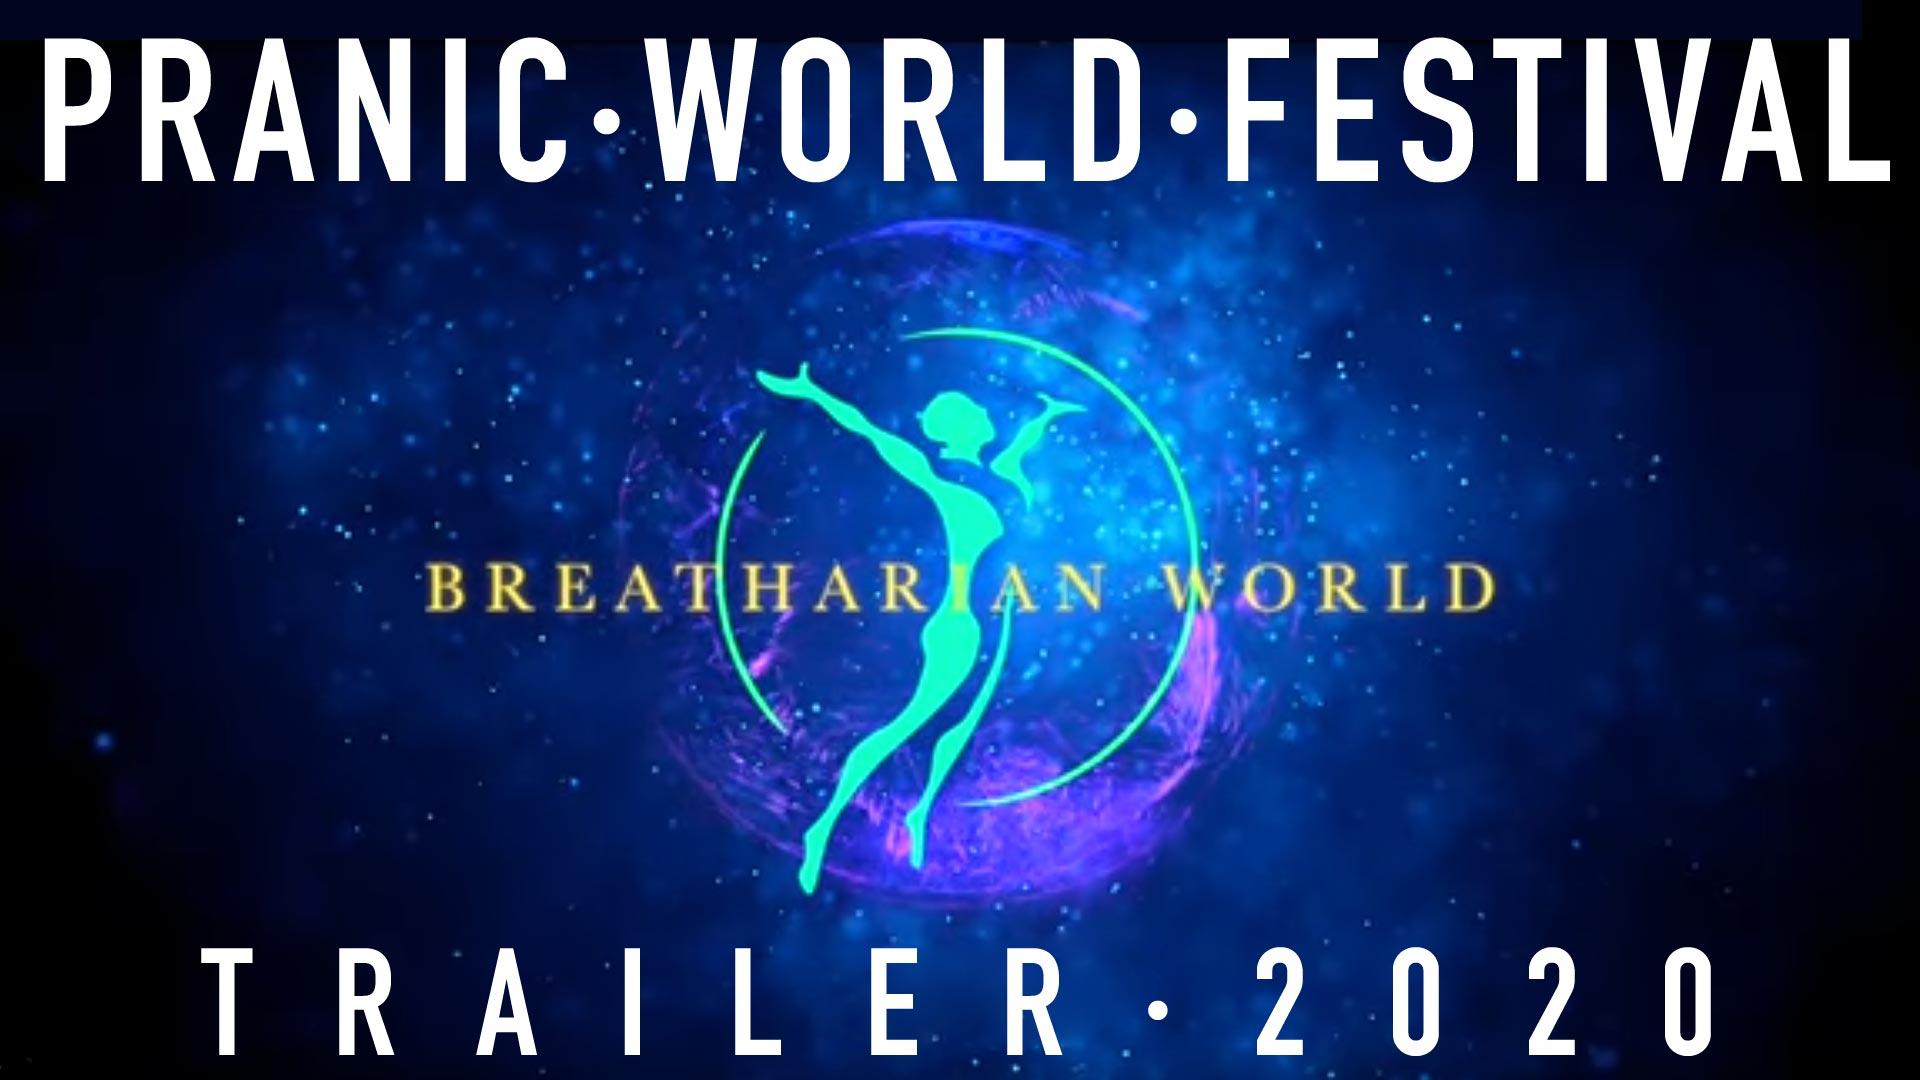 Pranic World Festival 2020